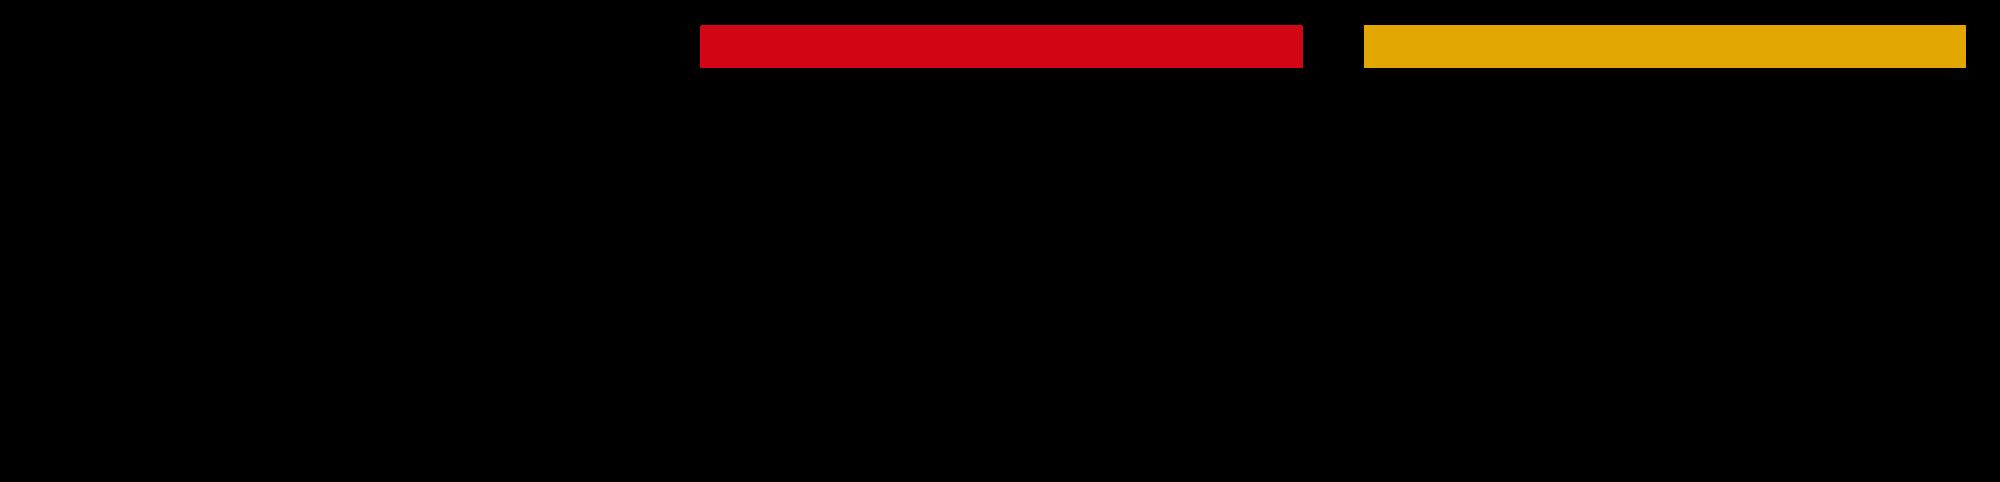 2000px dfl supercup wordmark svg